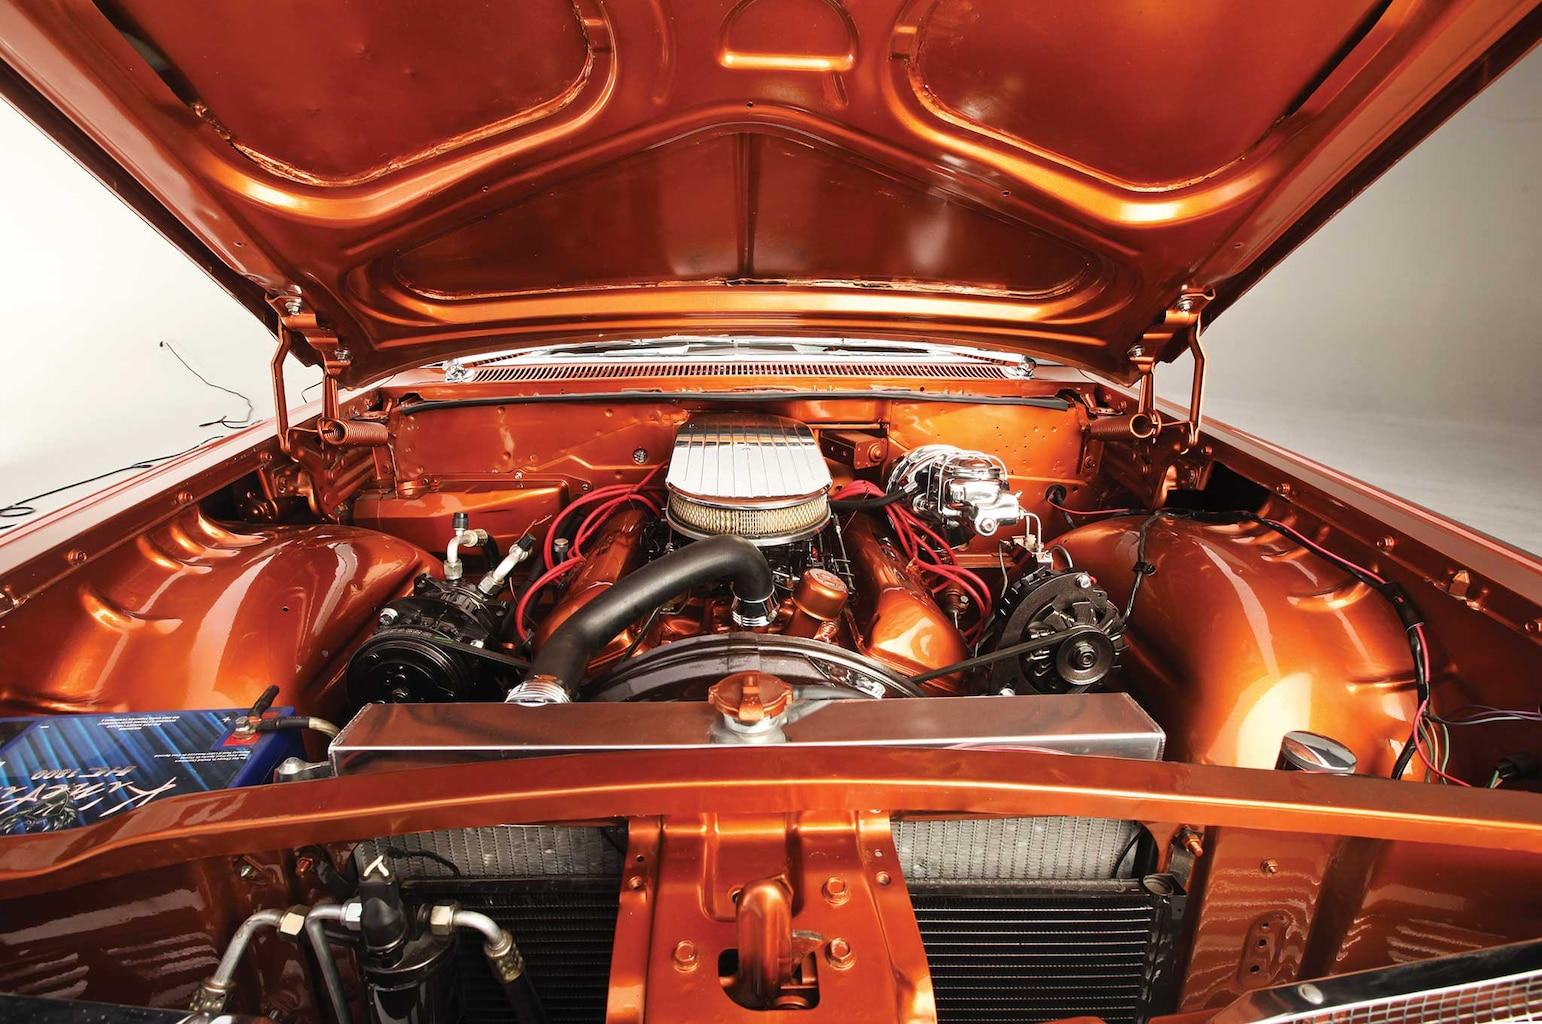 1959 chevrolet bel air 409 v8 005